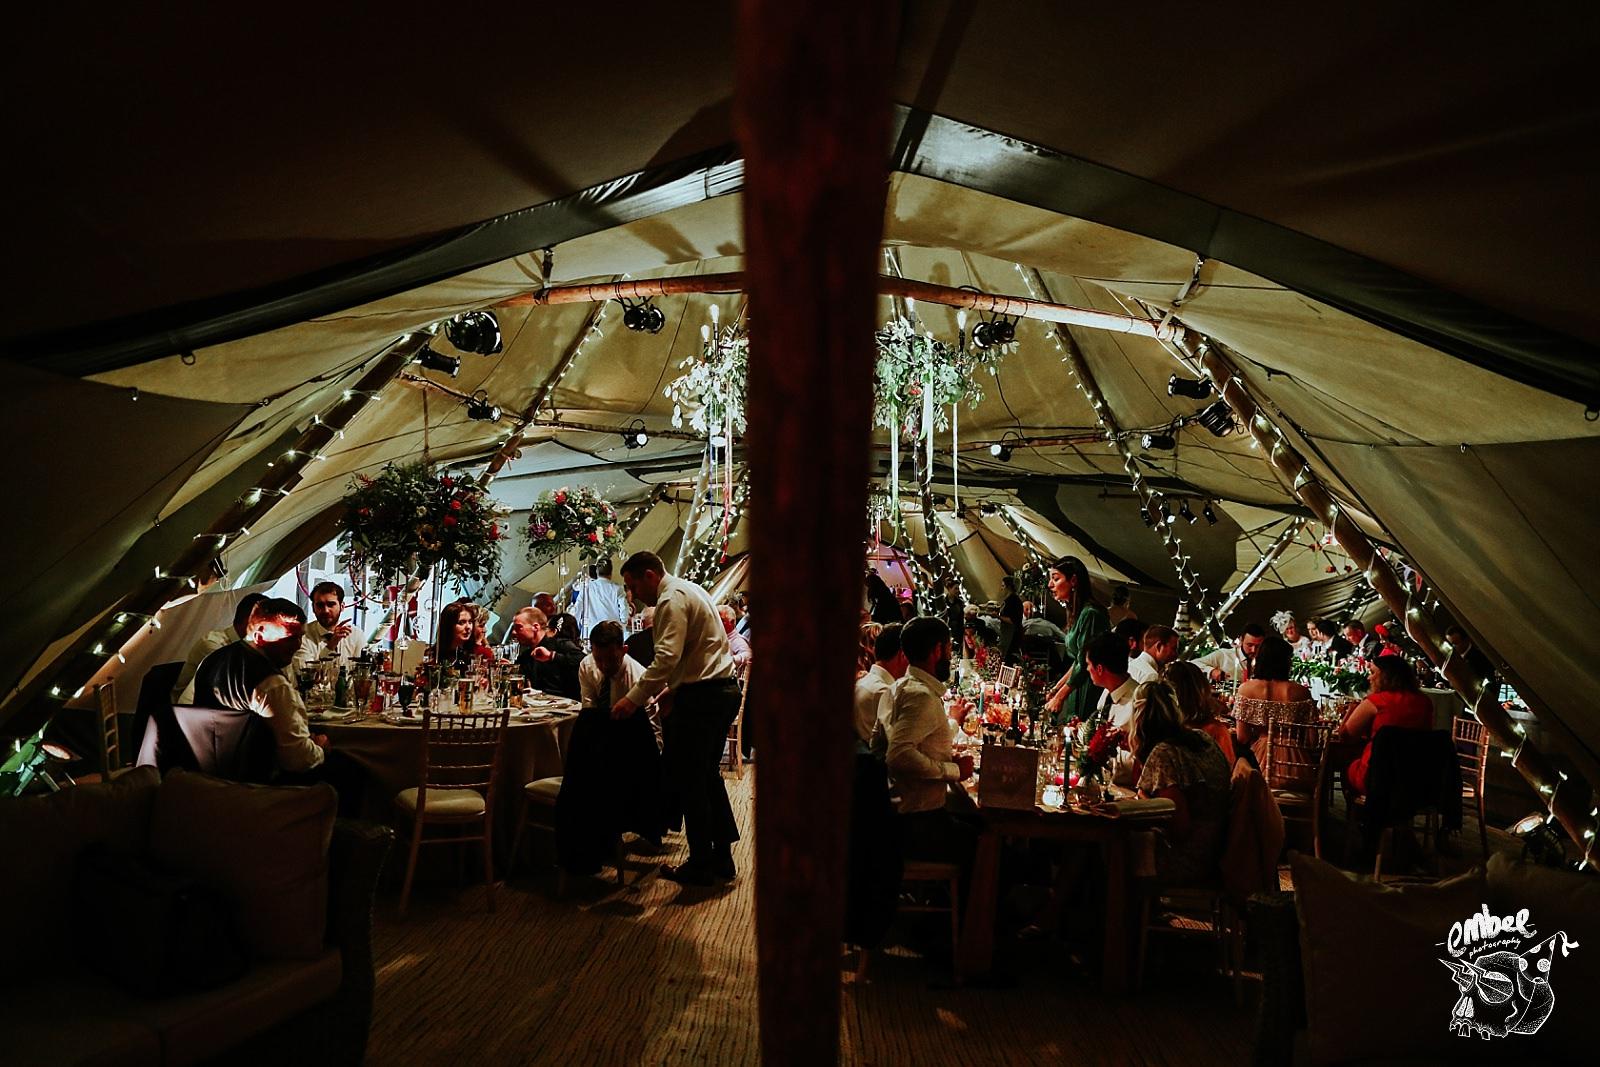 inside of wedding tipi